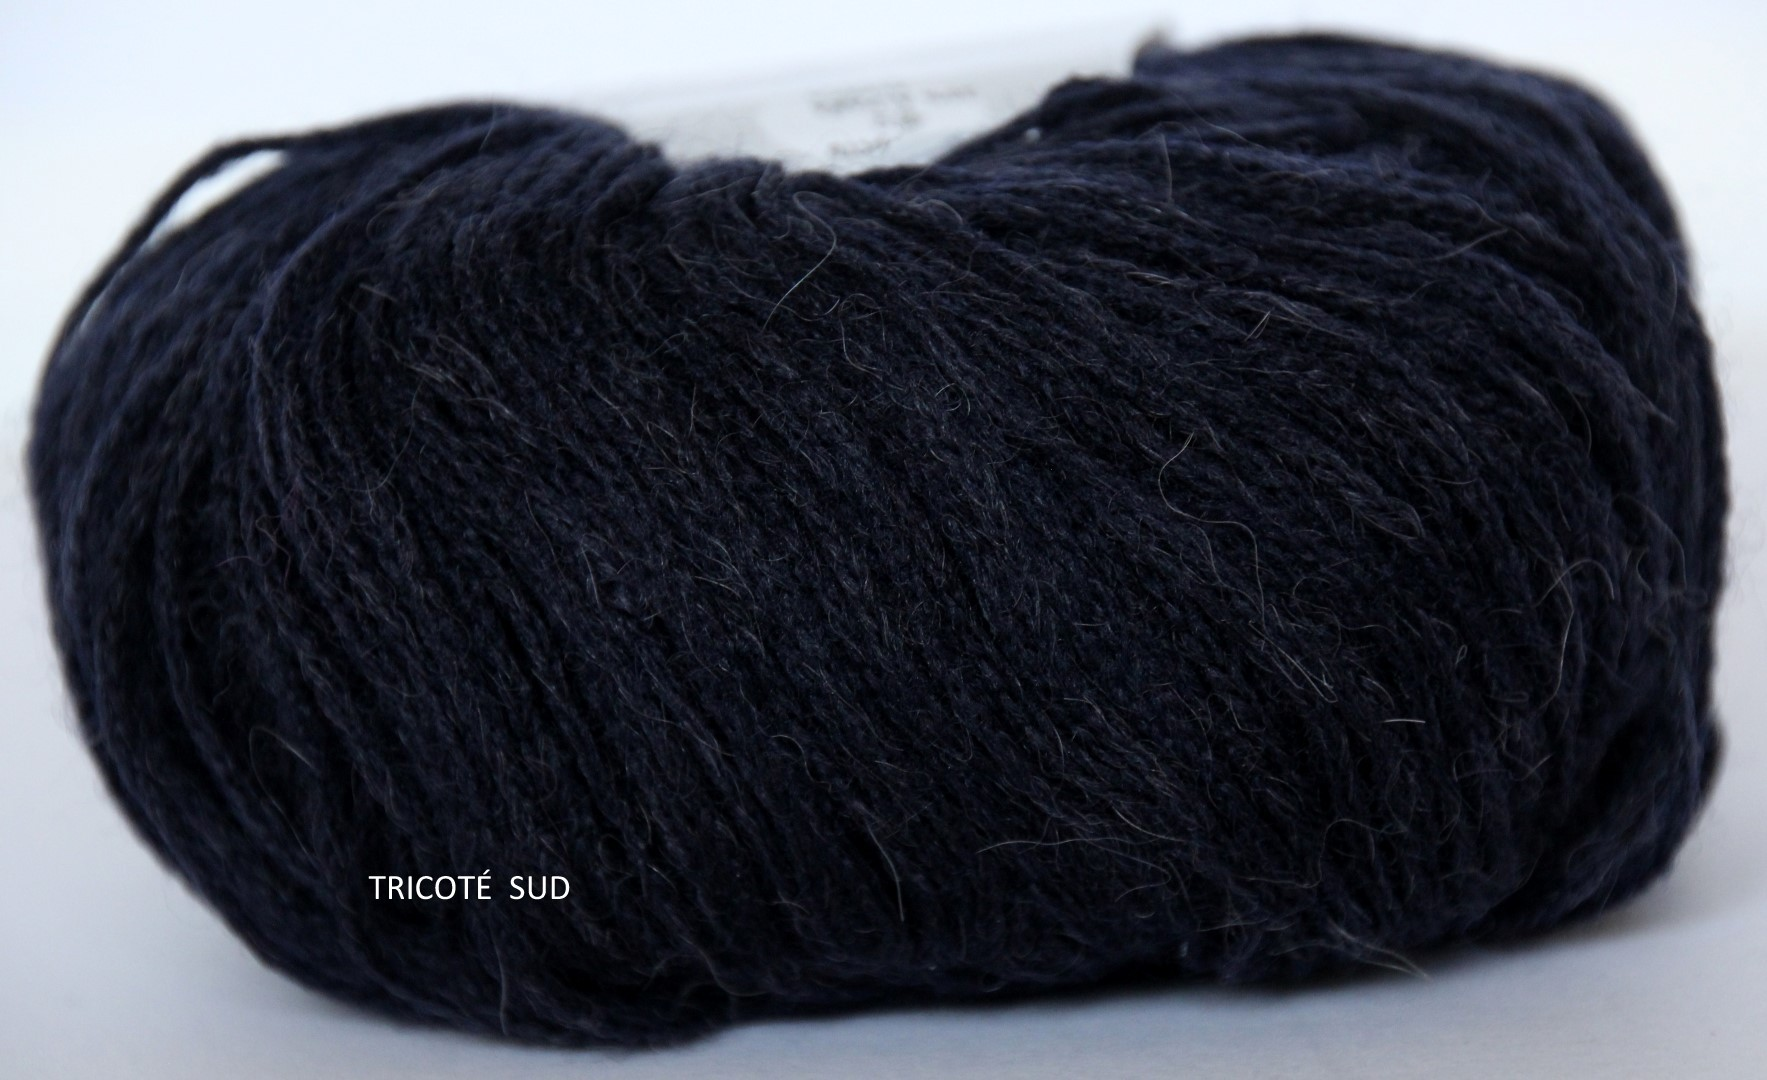 NOVENA COLORIS 25 (1) (Large)